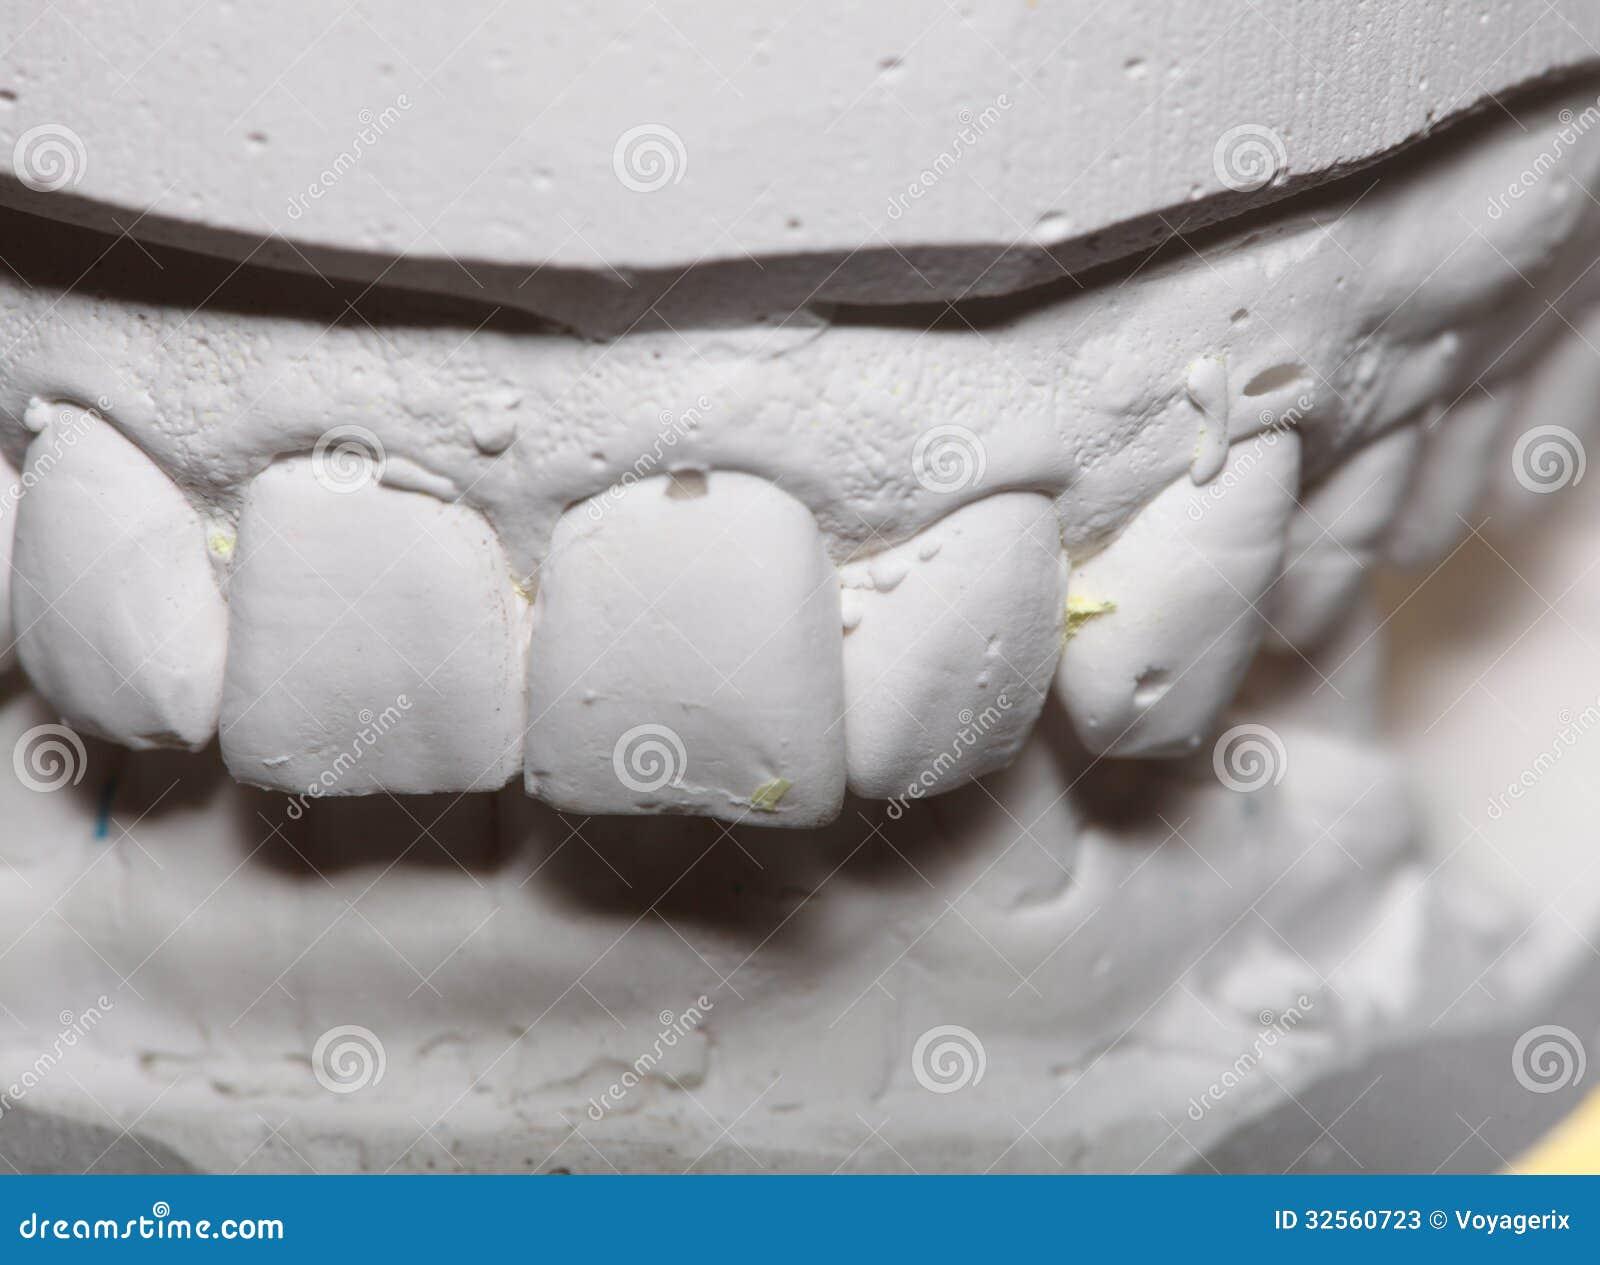 Dental Gypsum Plaster : Dental gypsum model mould of teeth in plaster stock photos